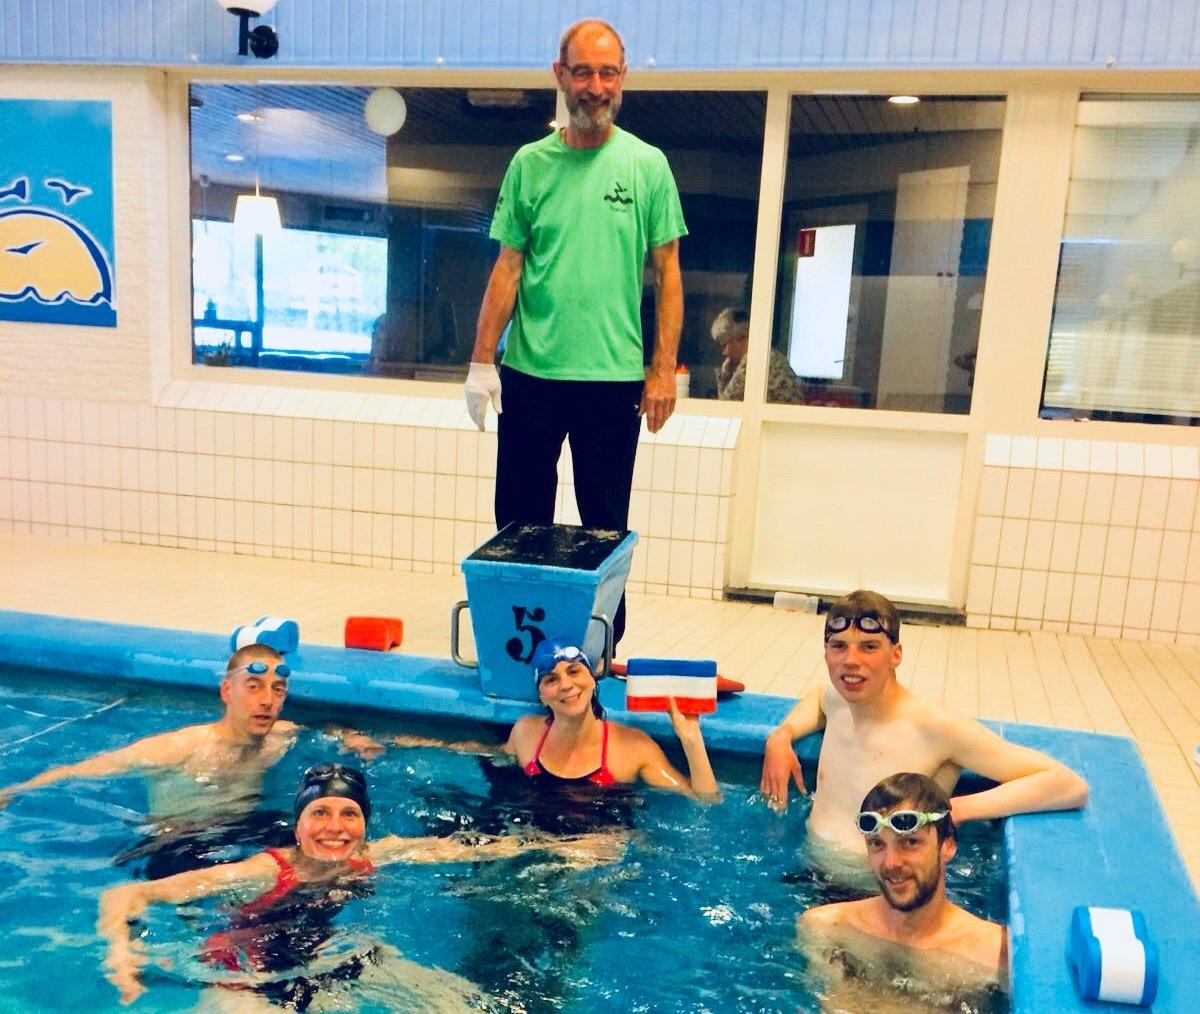 algemeen - UHTT Basiscursus zwemmen - UHTT start eigen zwemcursus 'basistechniek borstcrawl' - Zwemmen, trainen, Jorrit